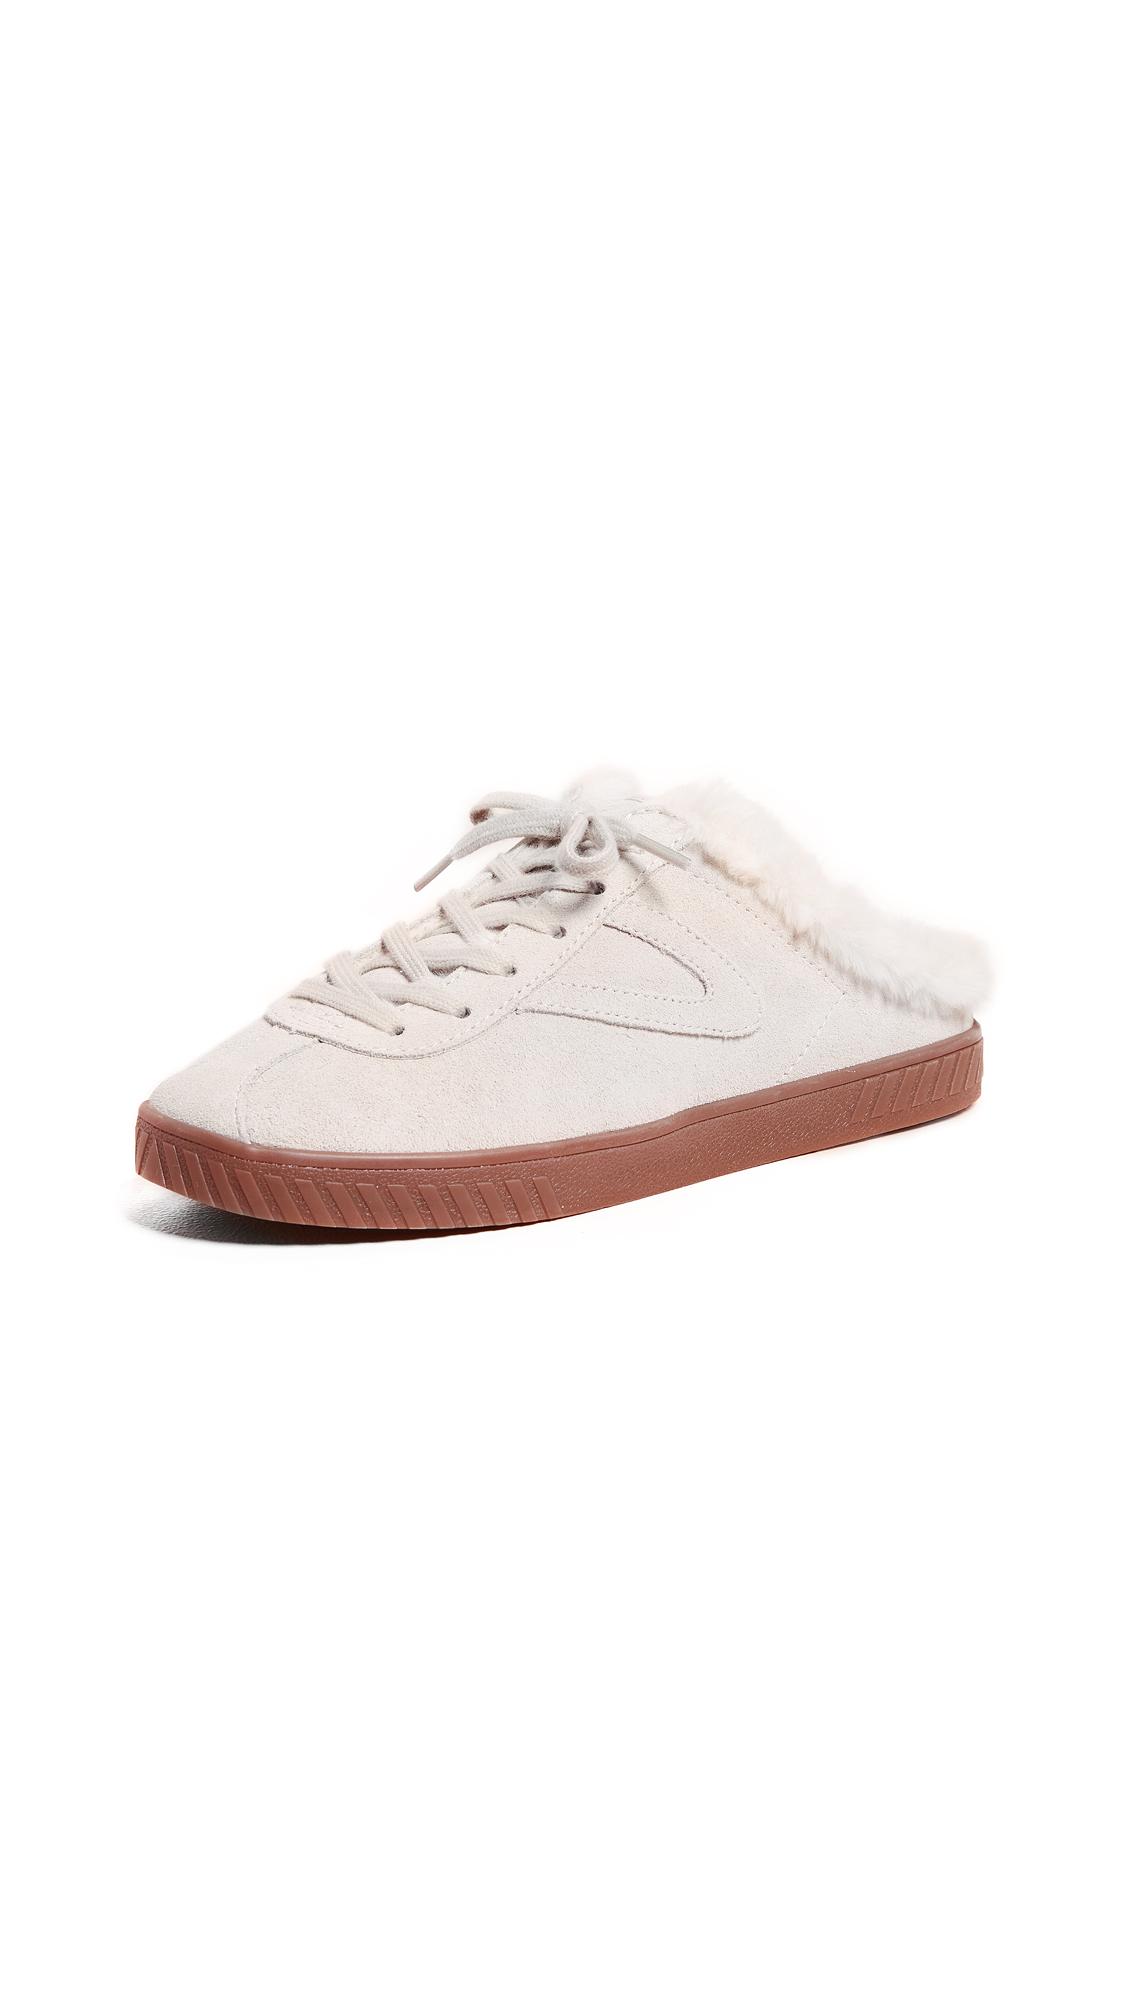 Tretorn Cam Mule Sneakers - Ice